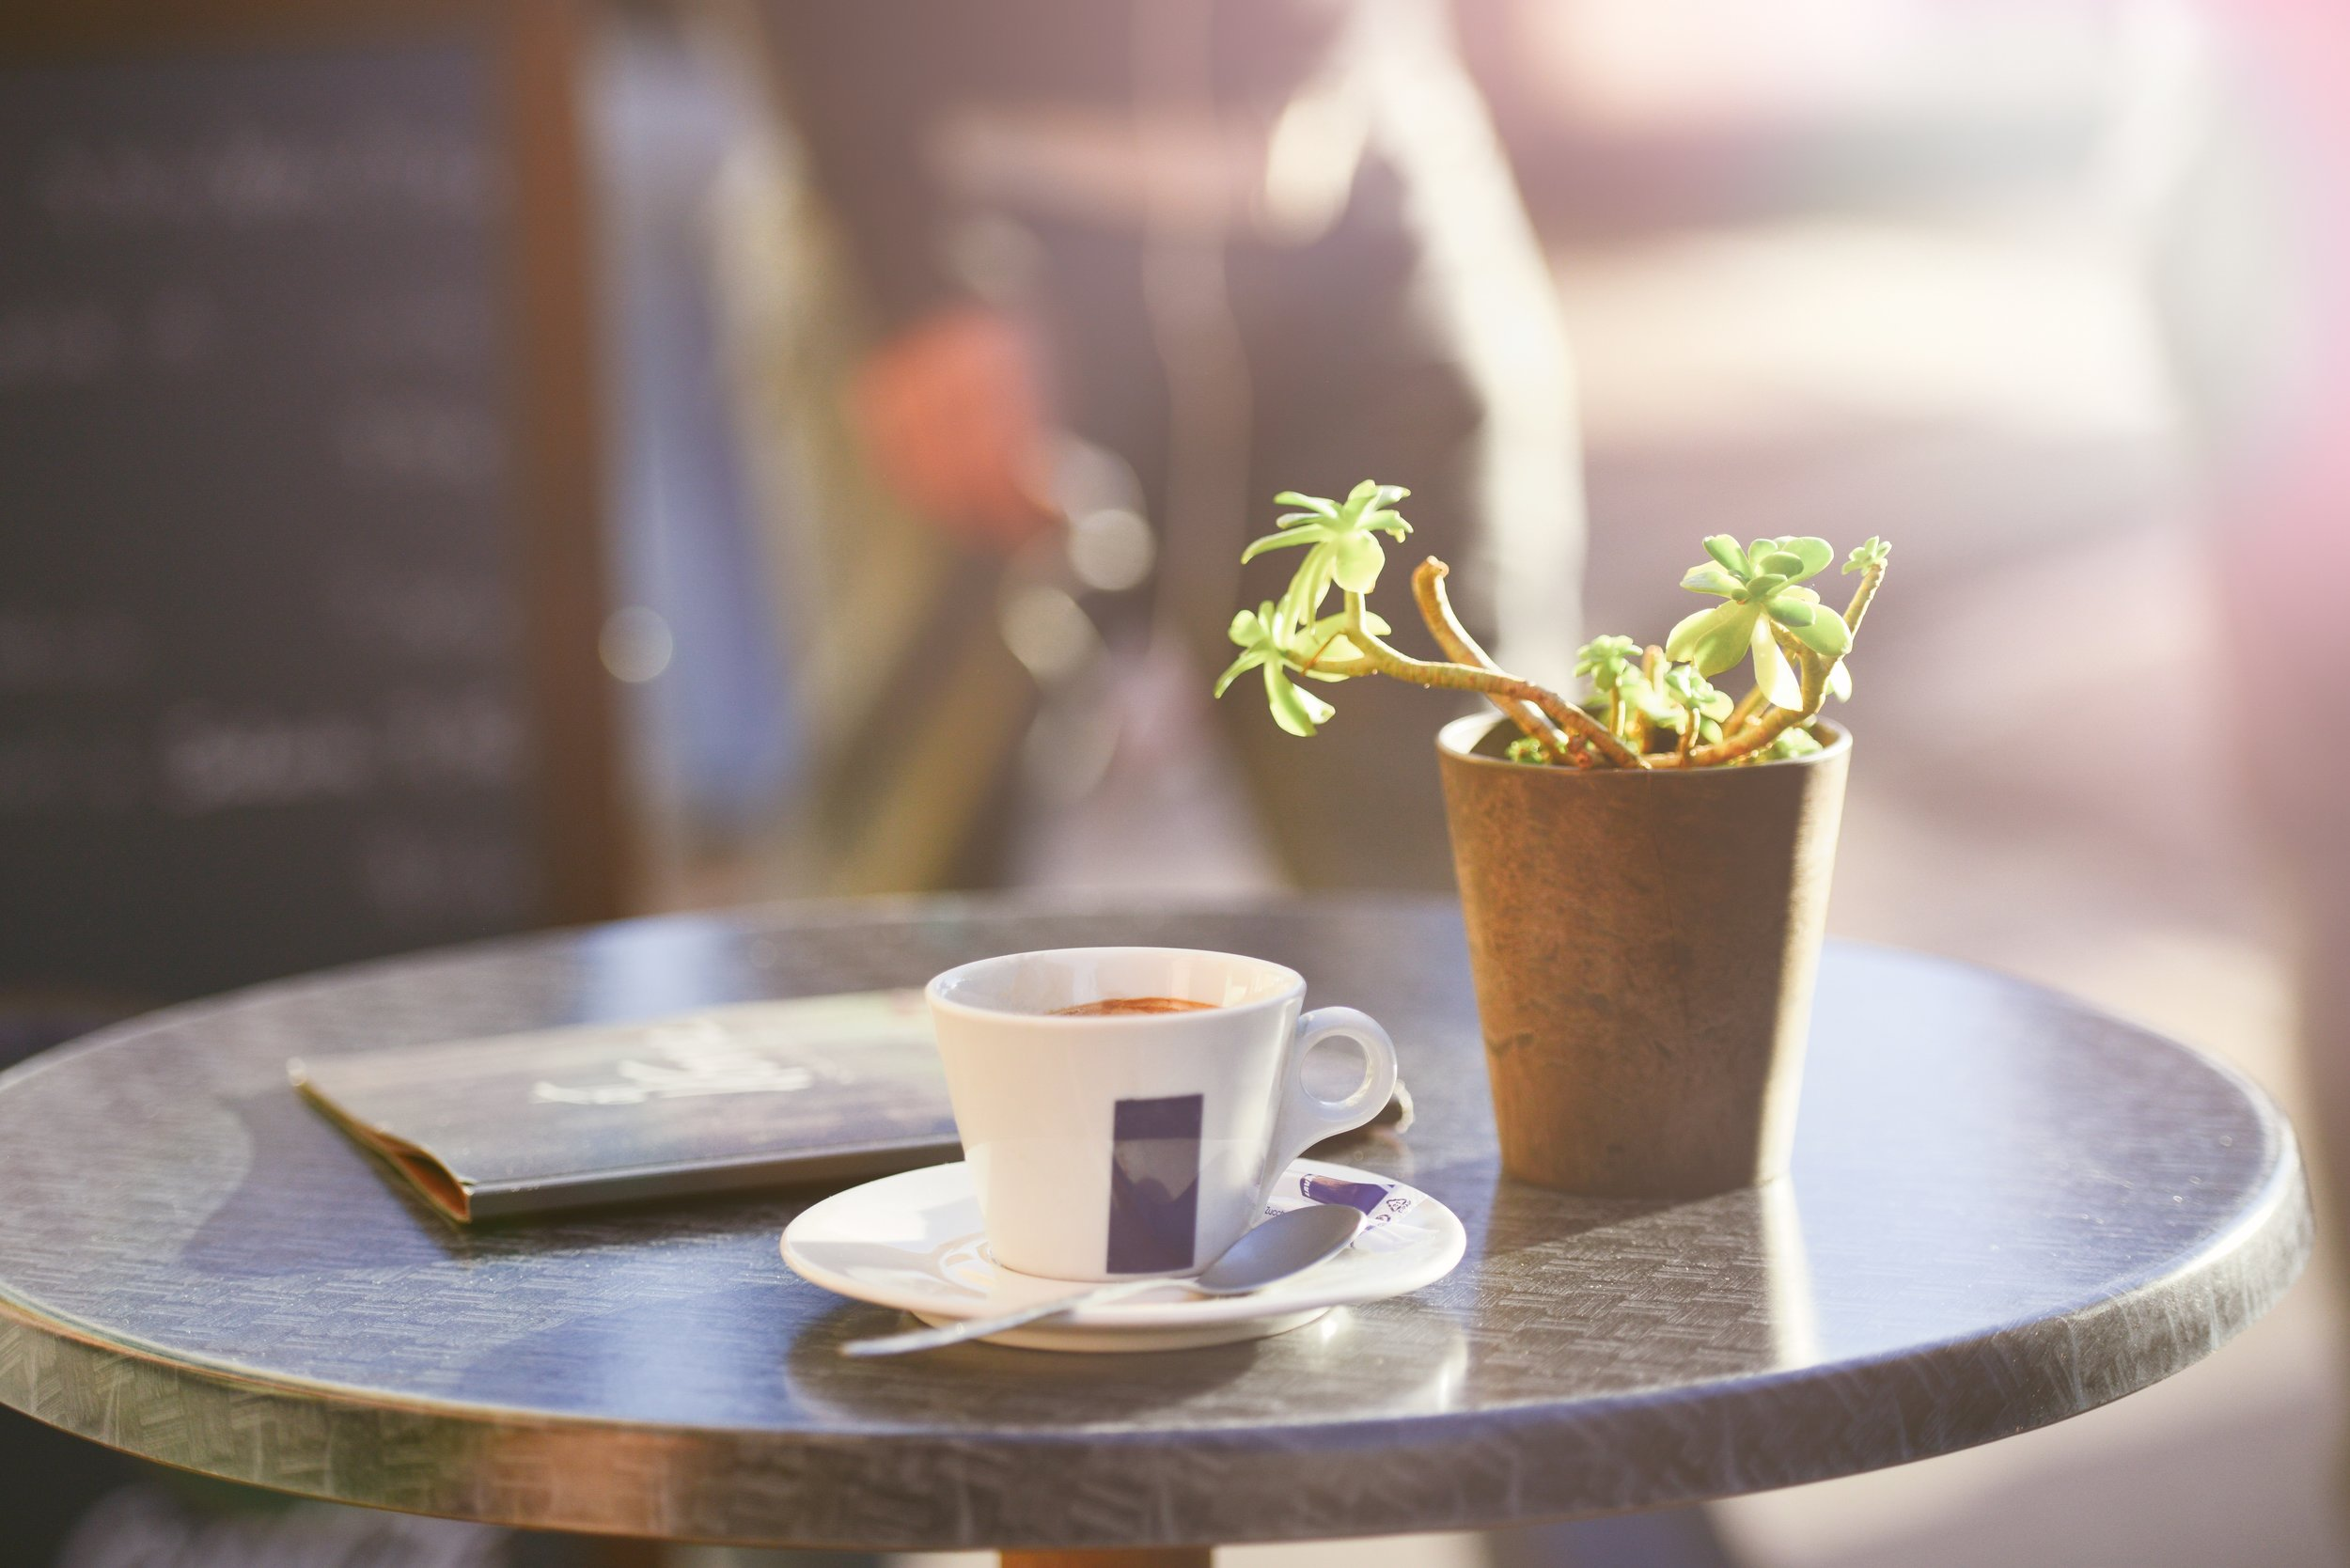 cafe-coffee-espresso-5201 (1).jpg